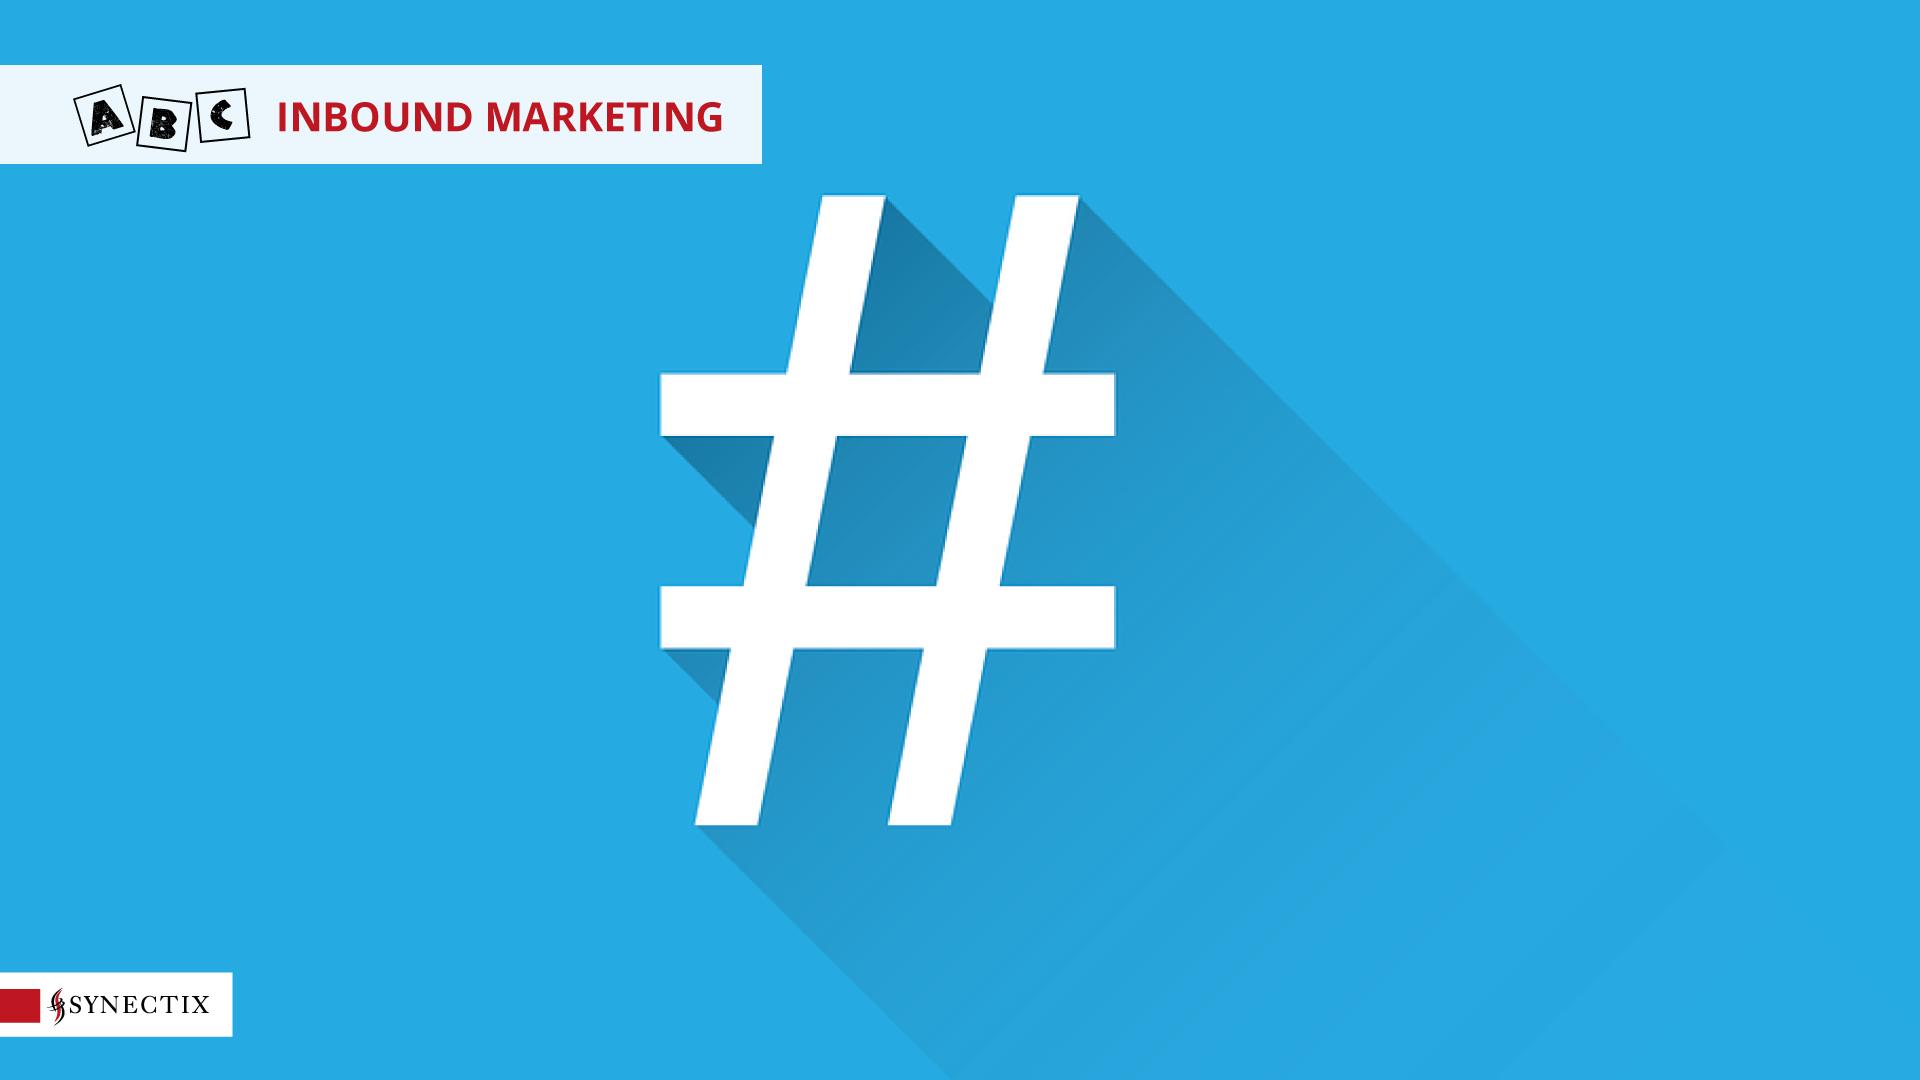 H come Hashtag popolari – ABC Inbound Marketing